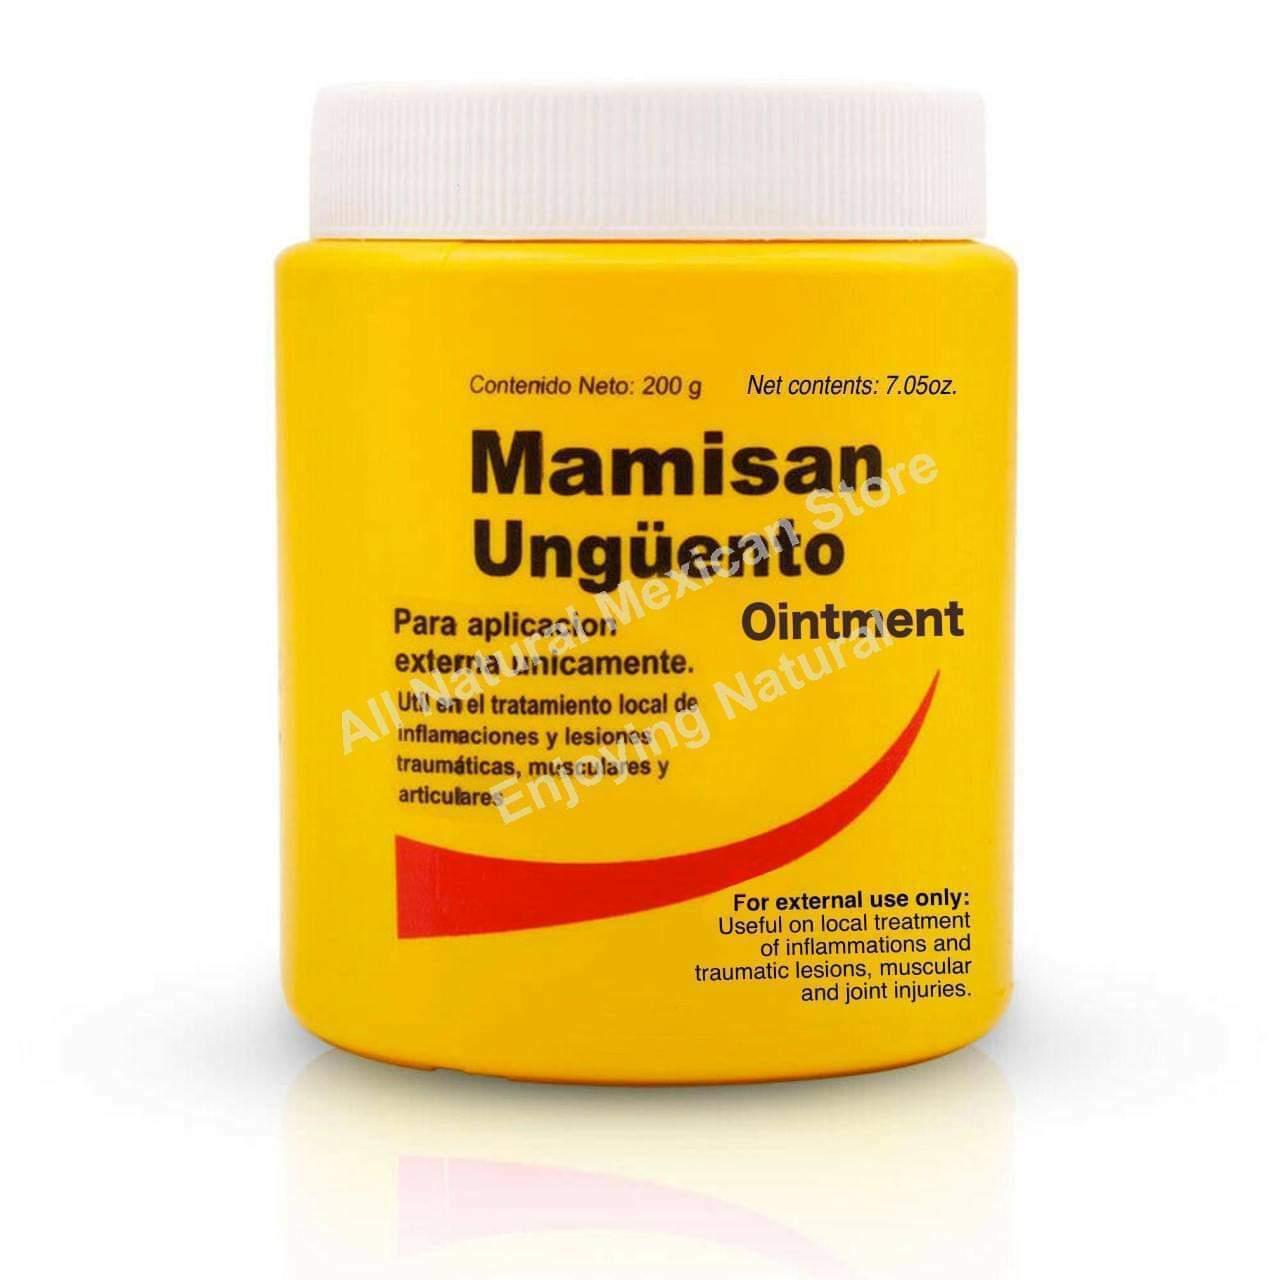 MAMISAN 200g (7oz) OINTMENT LARGE Unguento Mamisan Inflammation FREE Shipping